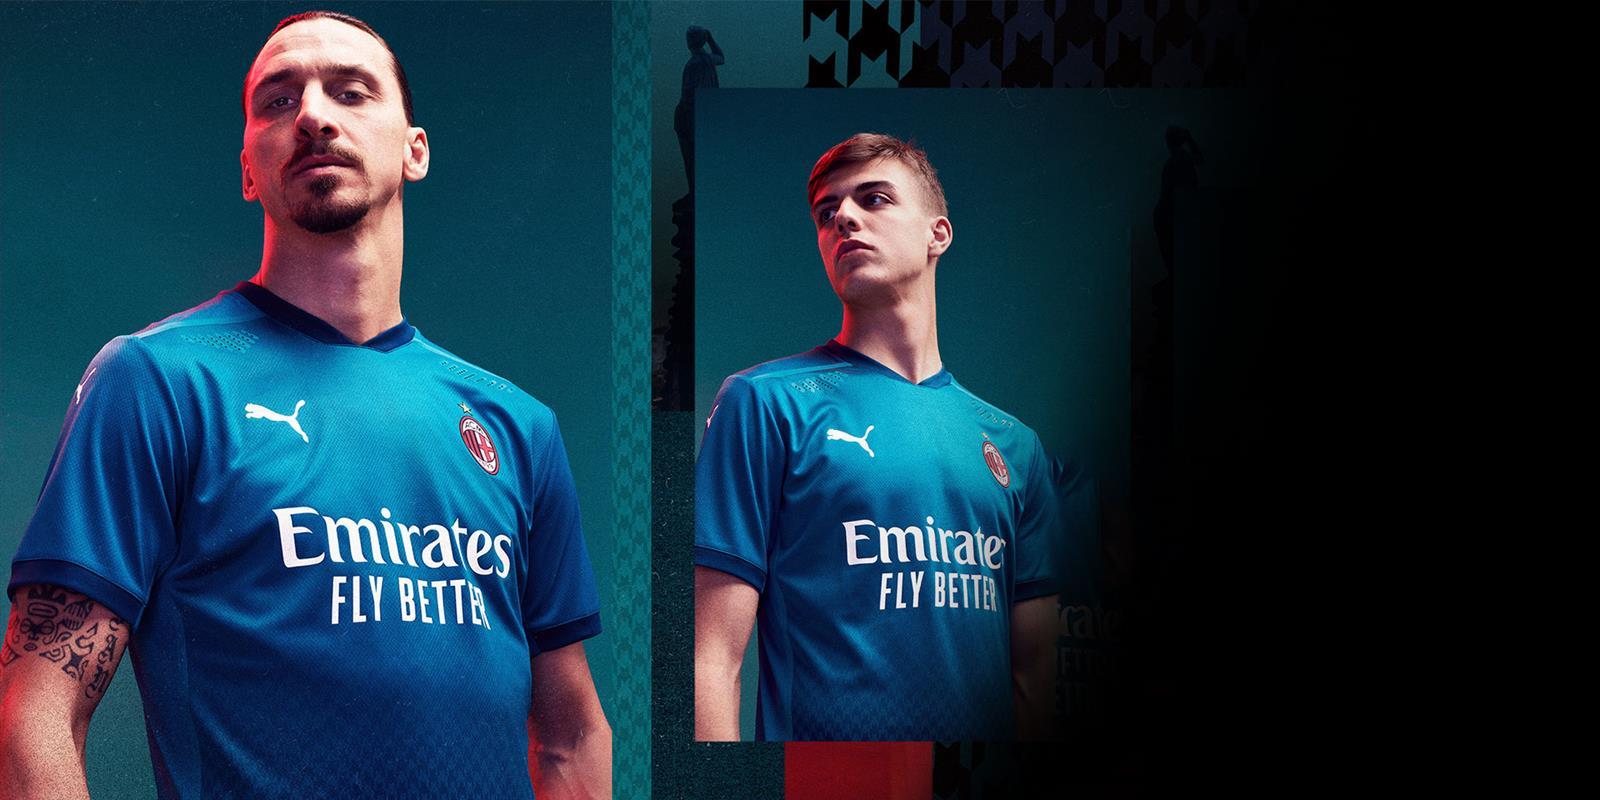 Puma Ac Milan Present New 2020 21 Third Kit Inspired By Italian High End Fashion